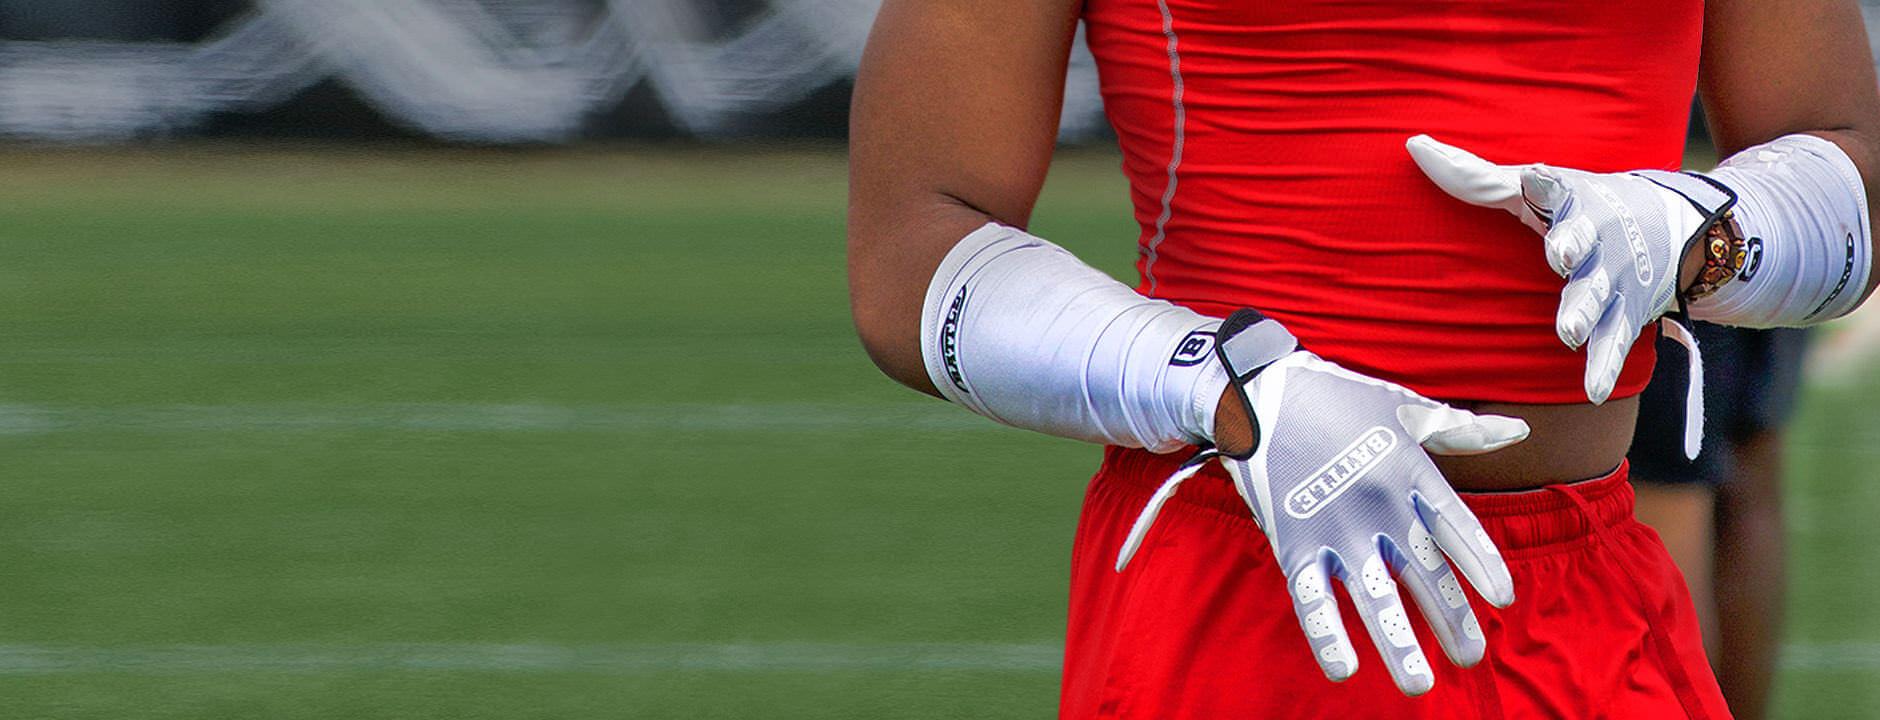 Battle Football Gloves